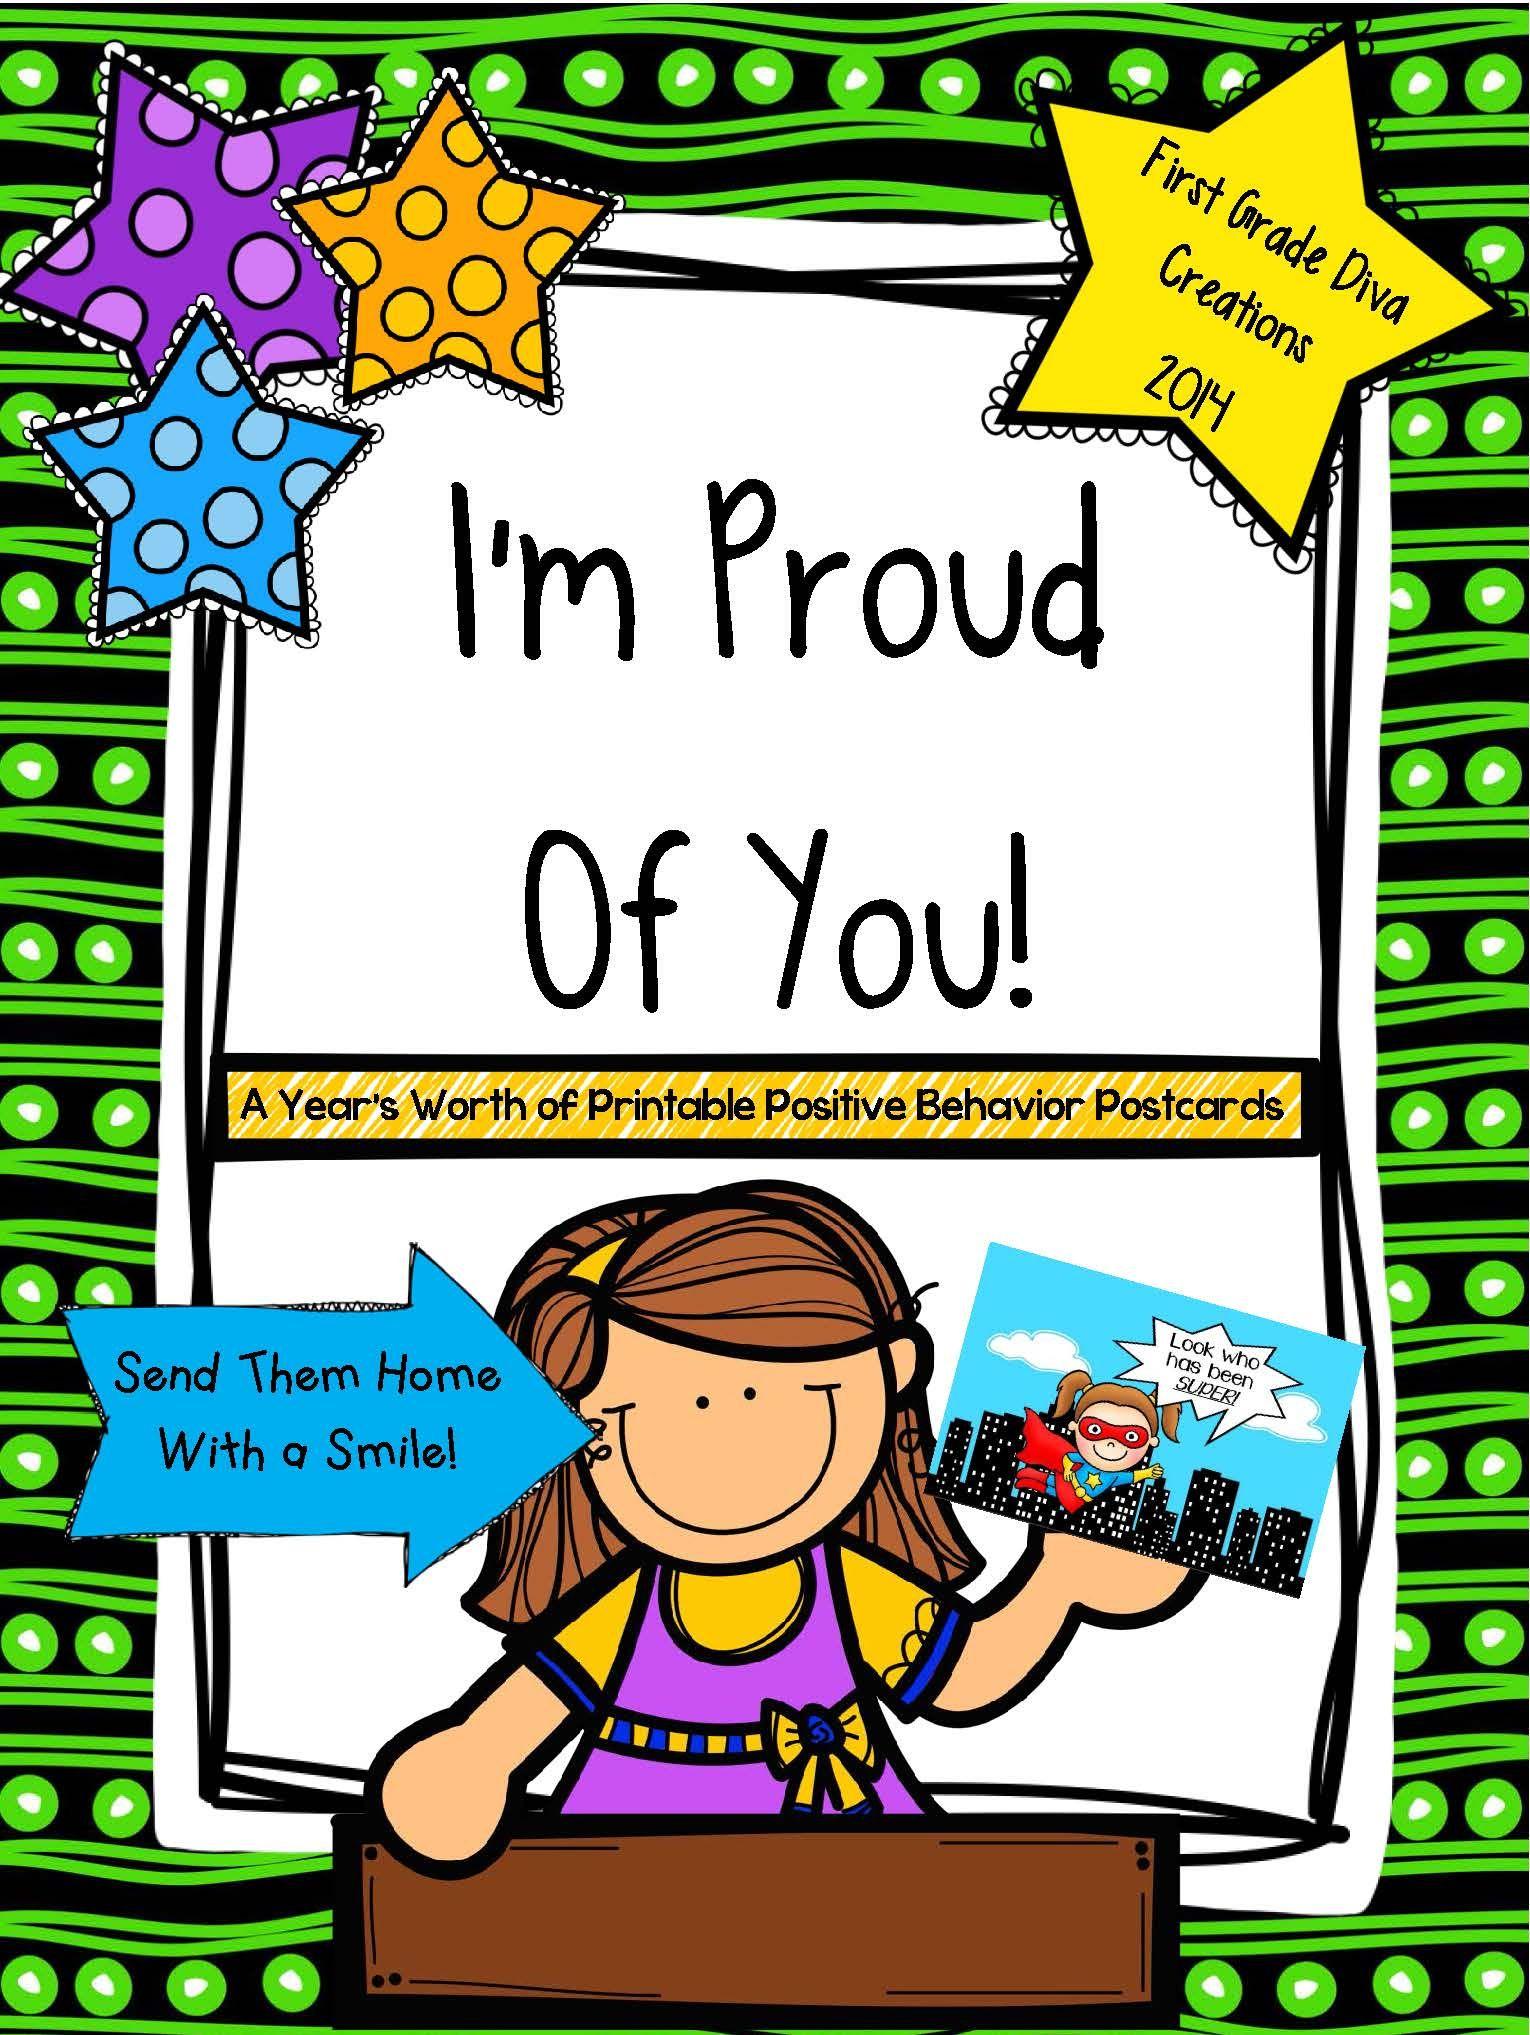 Printable positive behavior postcards. Proud clipart teacher student relationship